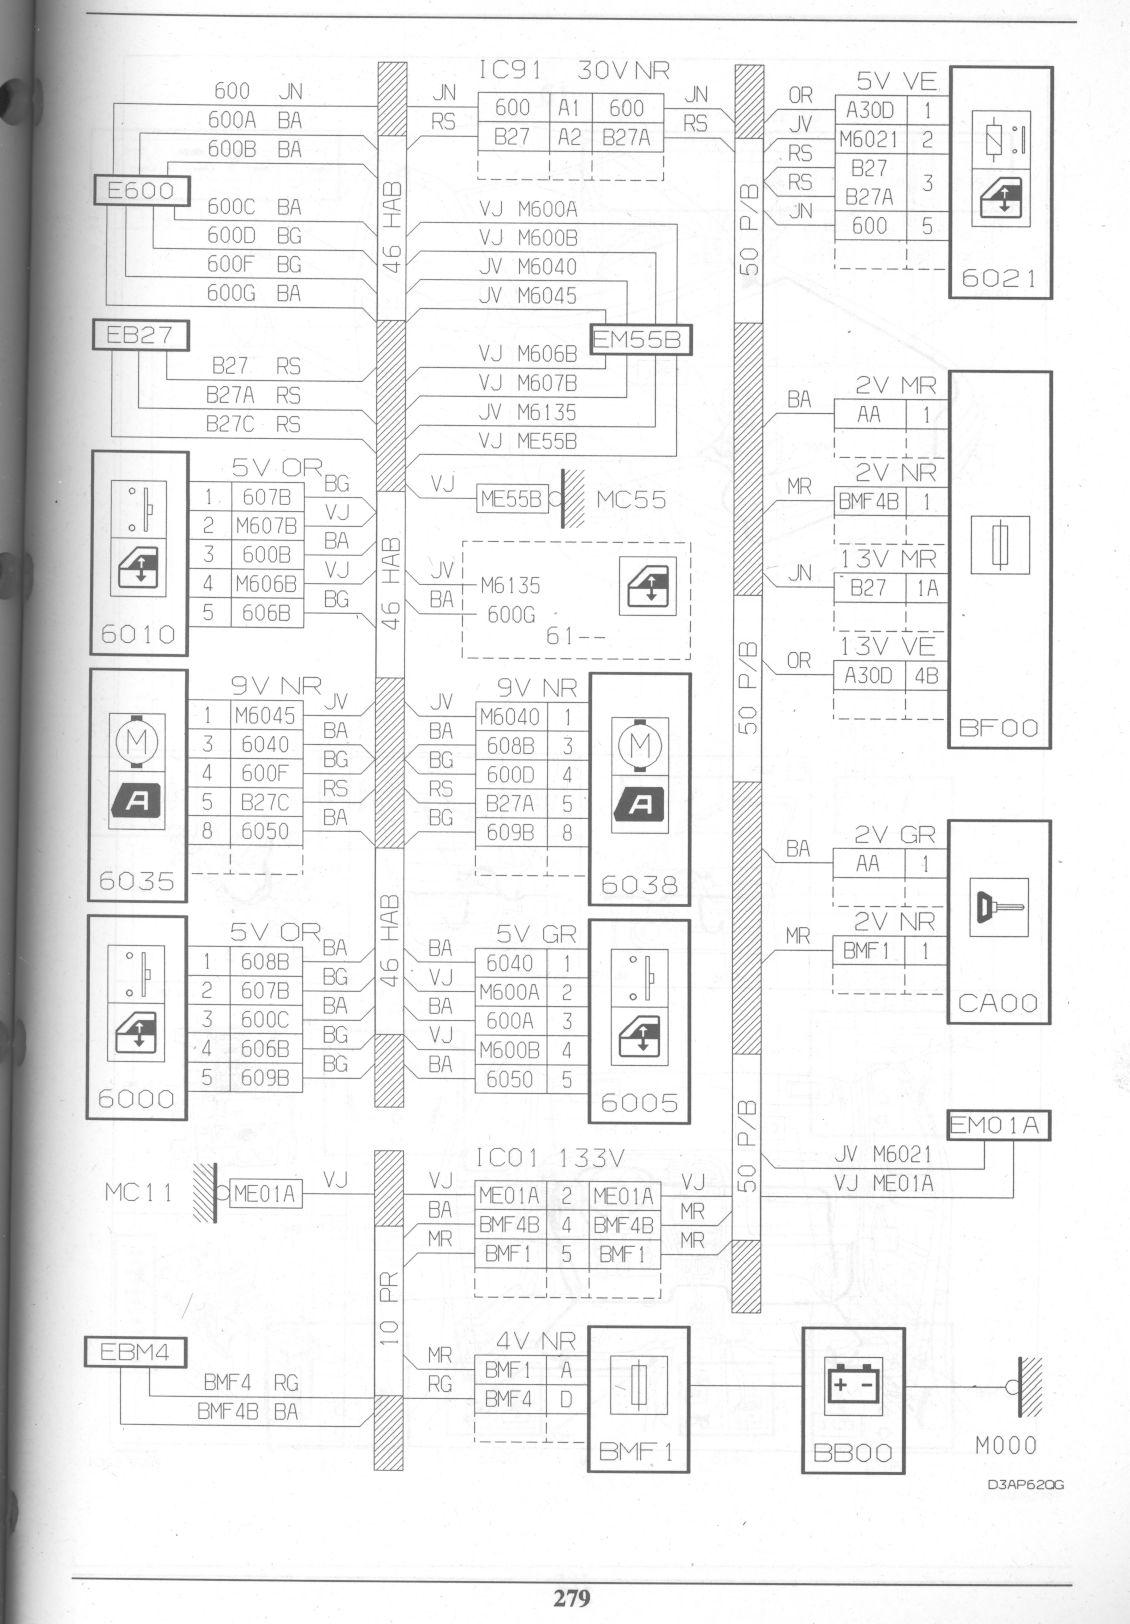 citroen c5 airbag wiring diagram ba xr6 speaker xantia schematic pdf xe librarycitroen